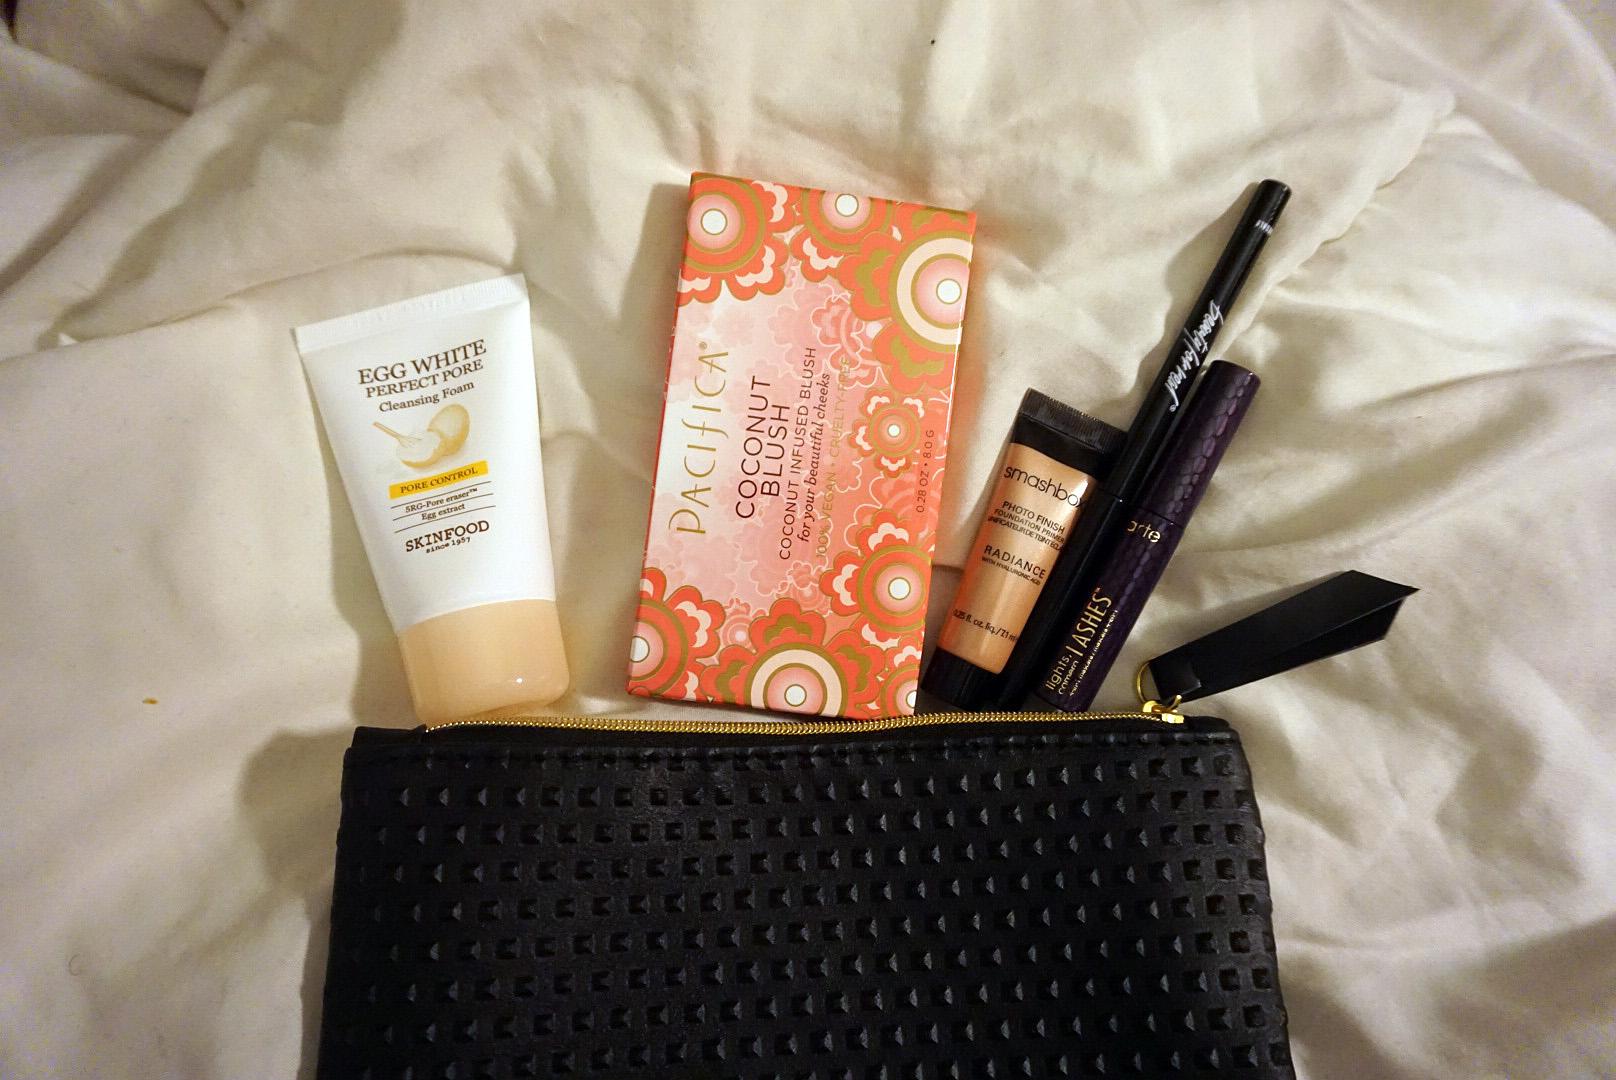 Ipsy-September-Review-Makeup-Beauty-LINDATENCHITRAN-2-1616x1080